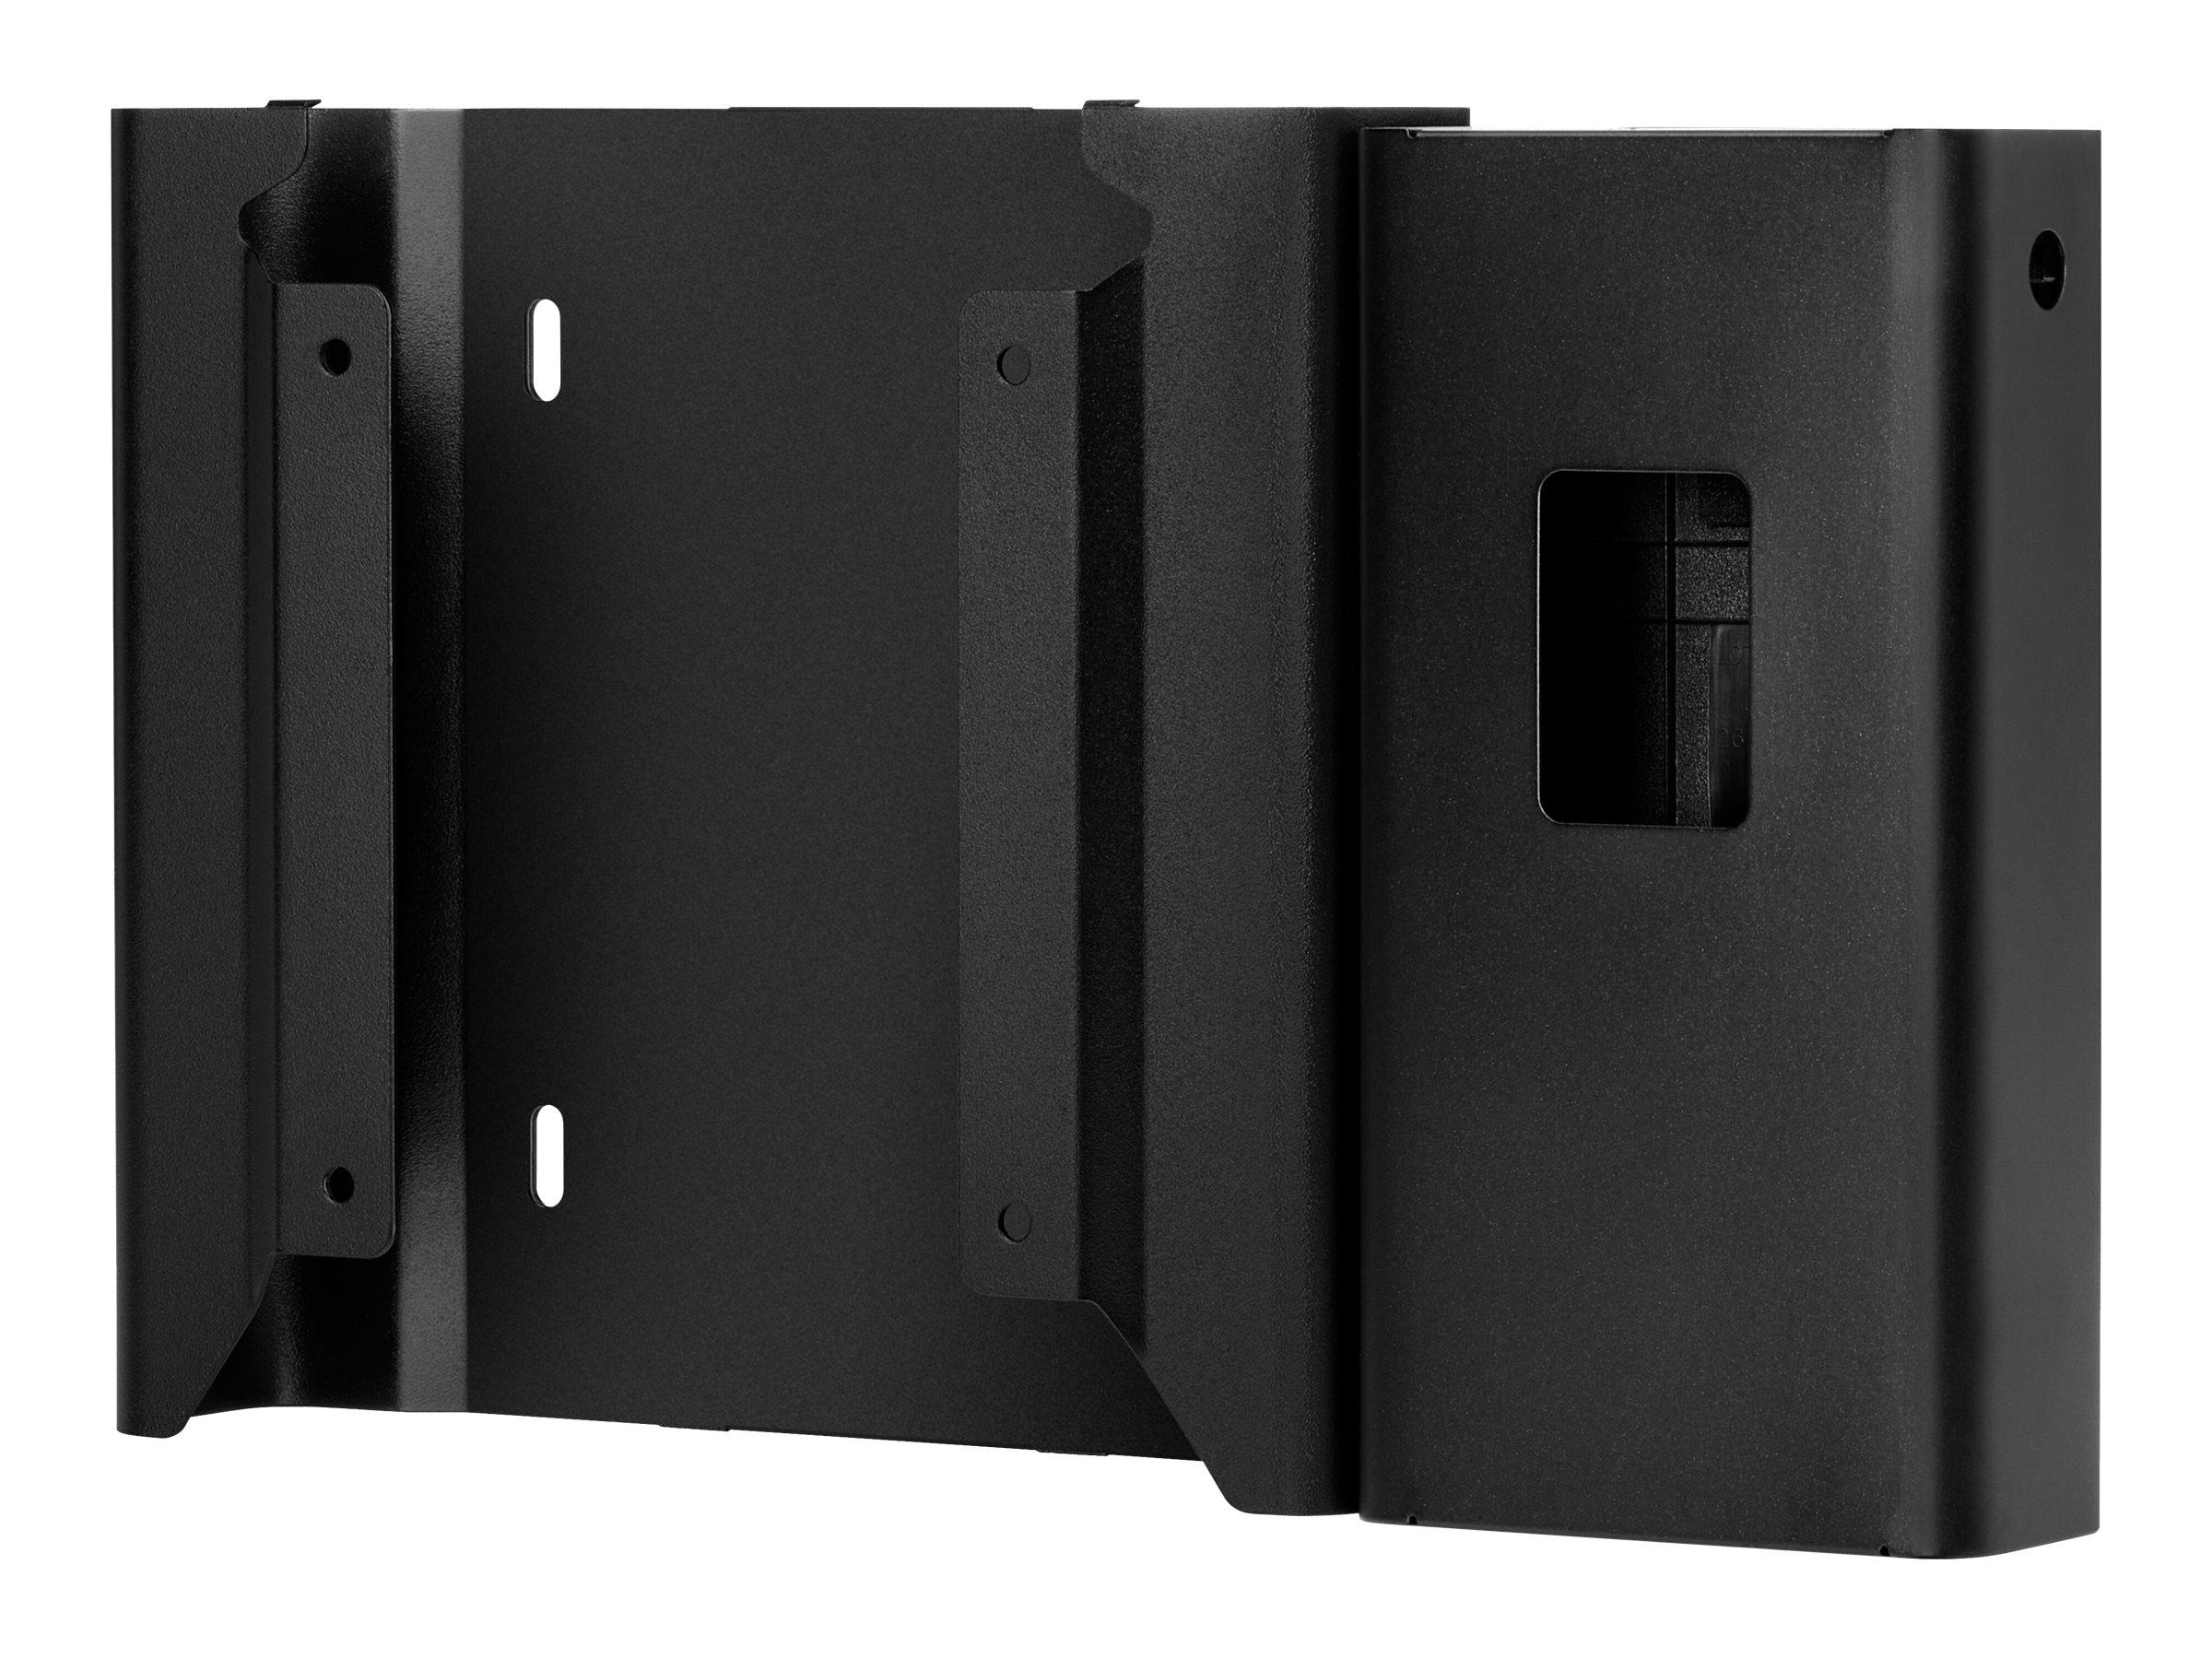 HP Dual VESA Sleeve v3 - Desktop-Hülle - für HP 260 G4 (mini desktop); EliteDesk 800 G6 (mini desktop); ProDesk 400 G6 (mini des